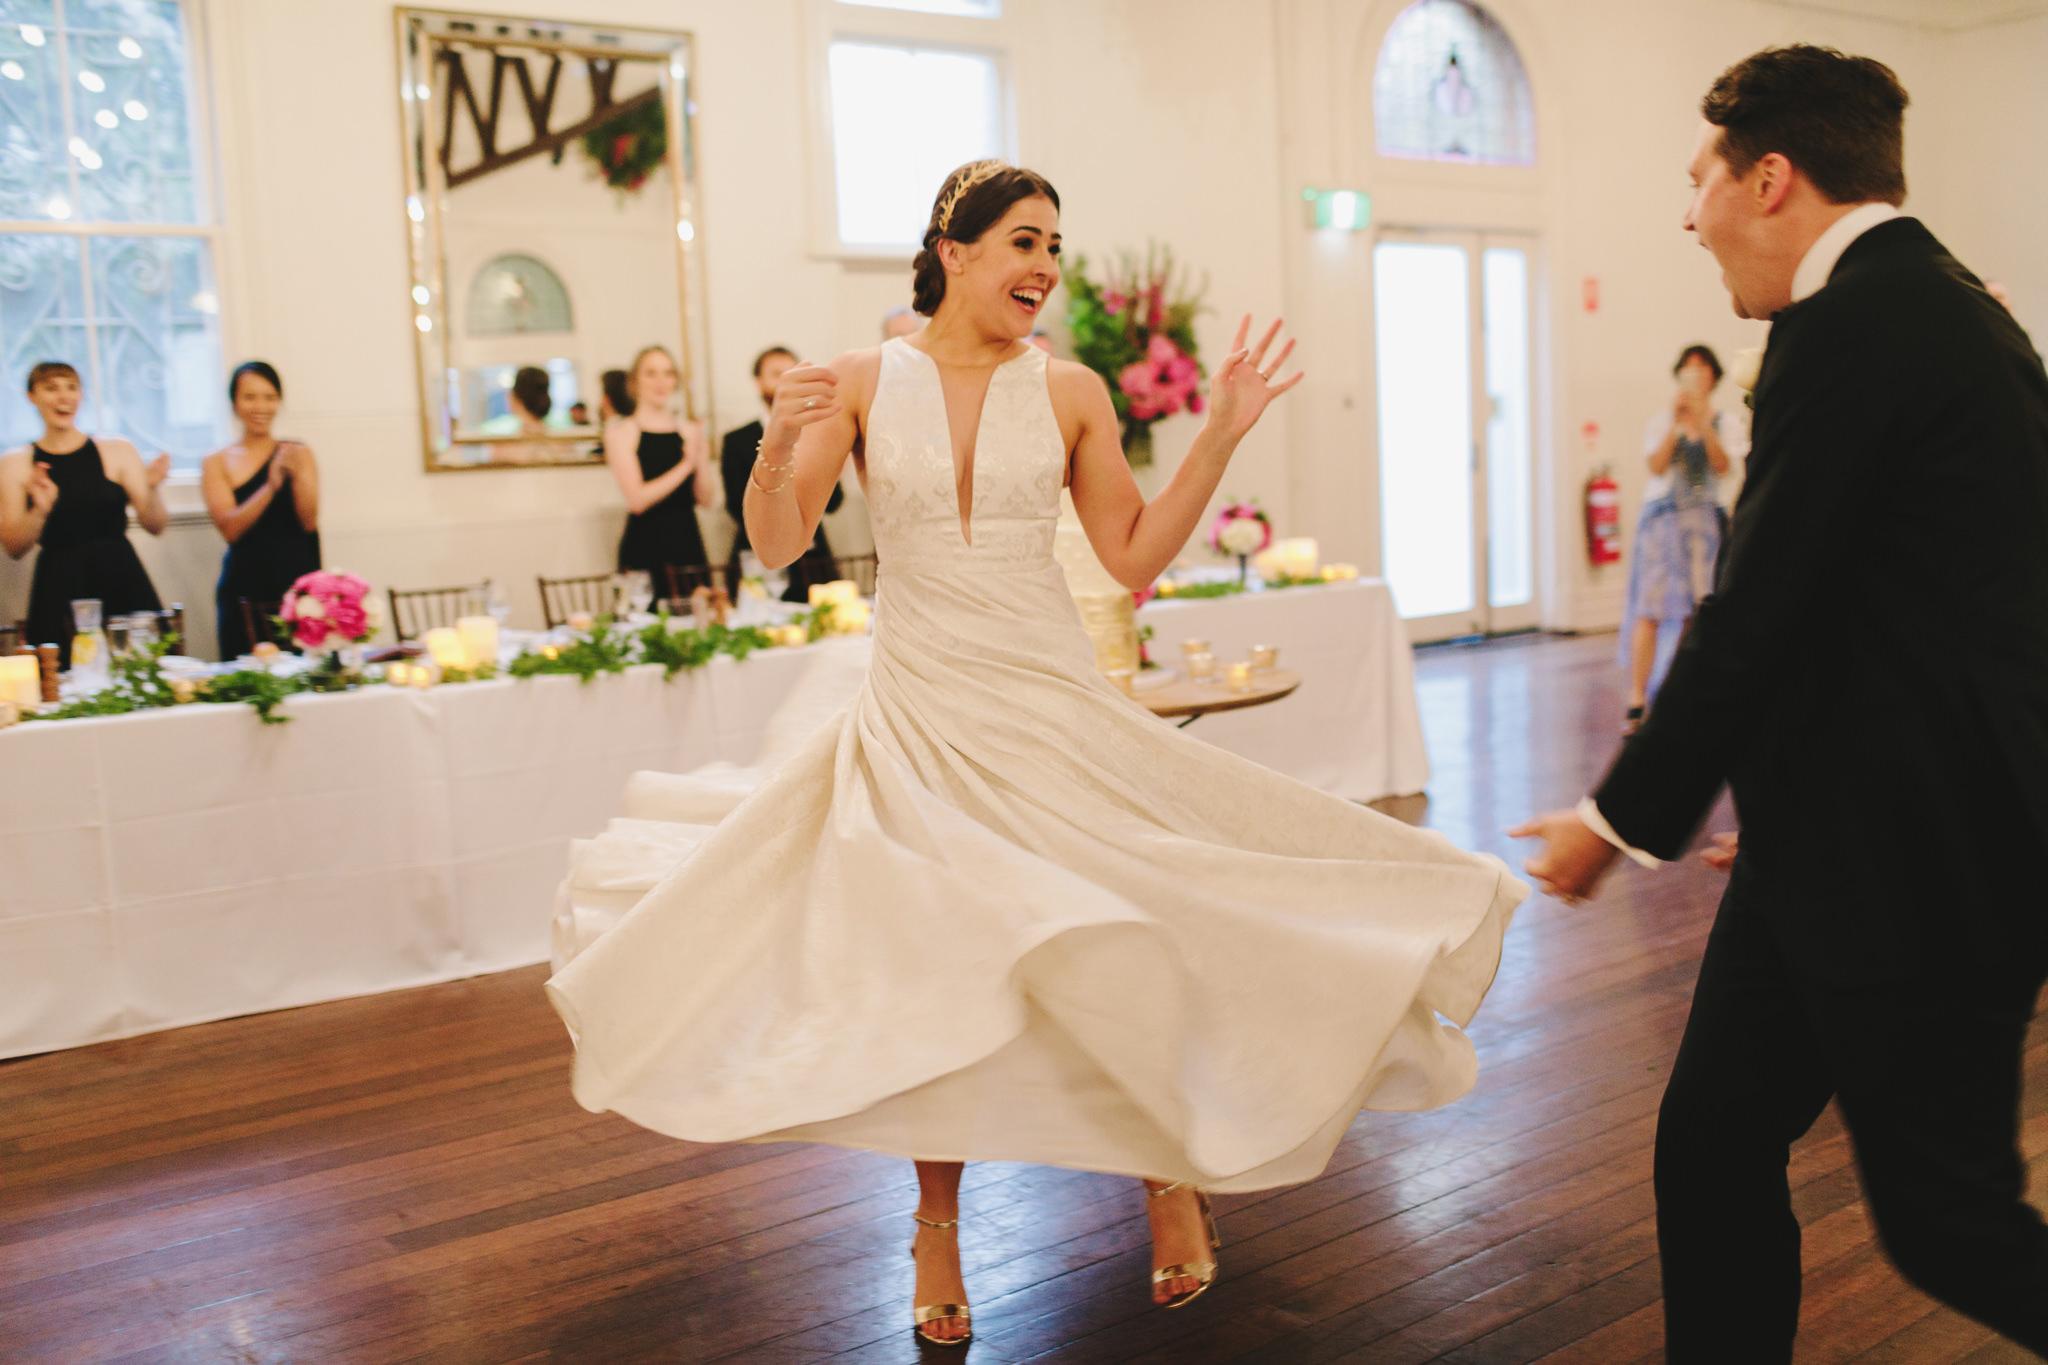 Abbotsford_Convent_Wedding_Peter_Anna098.JPG